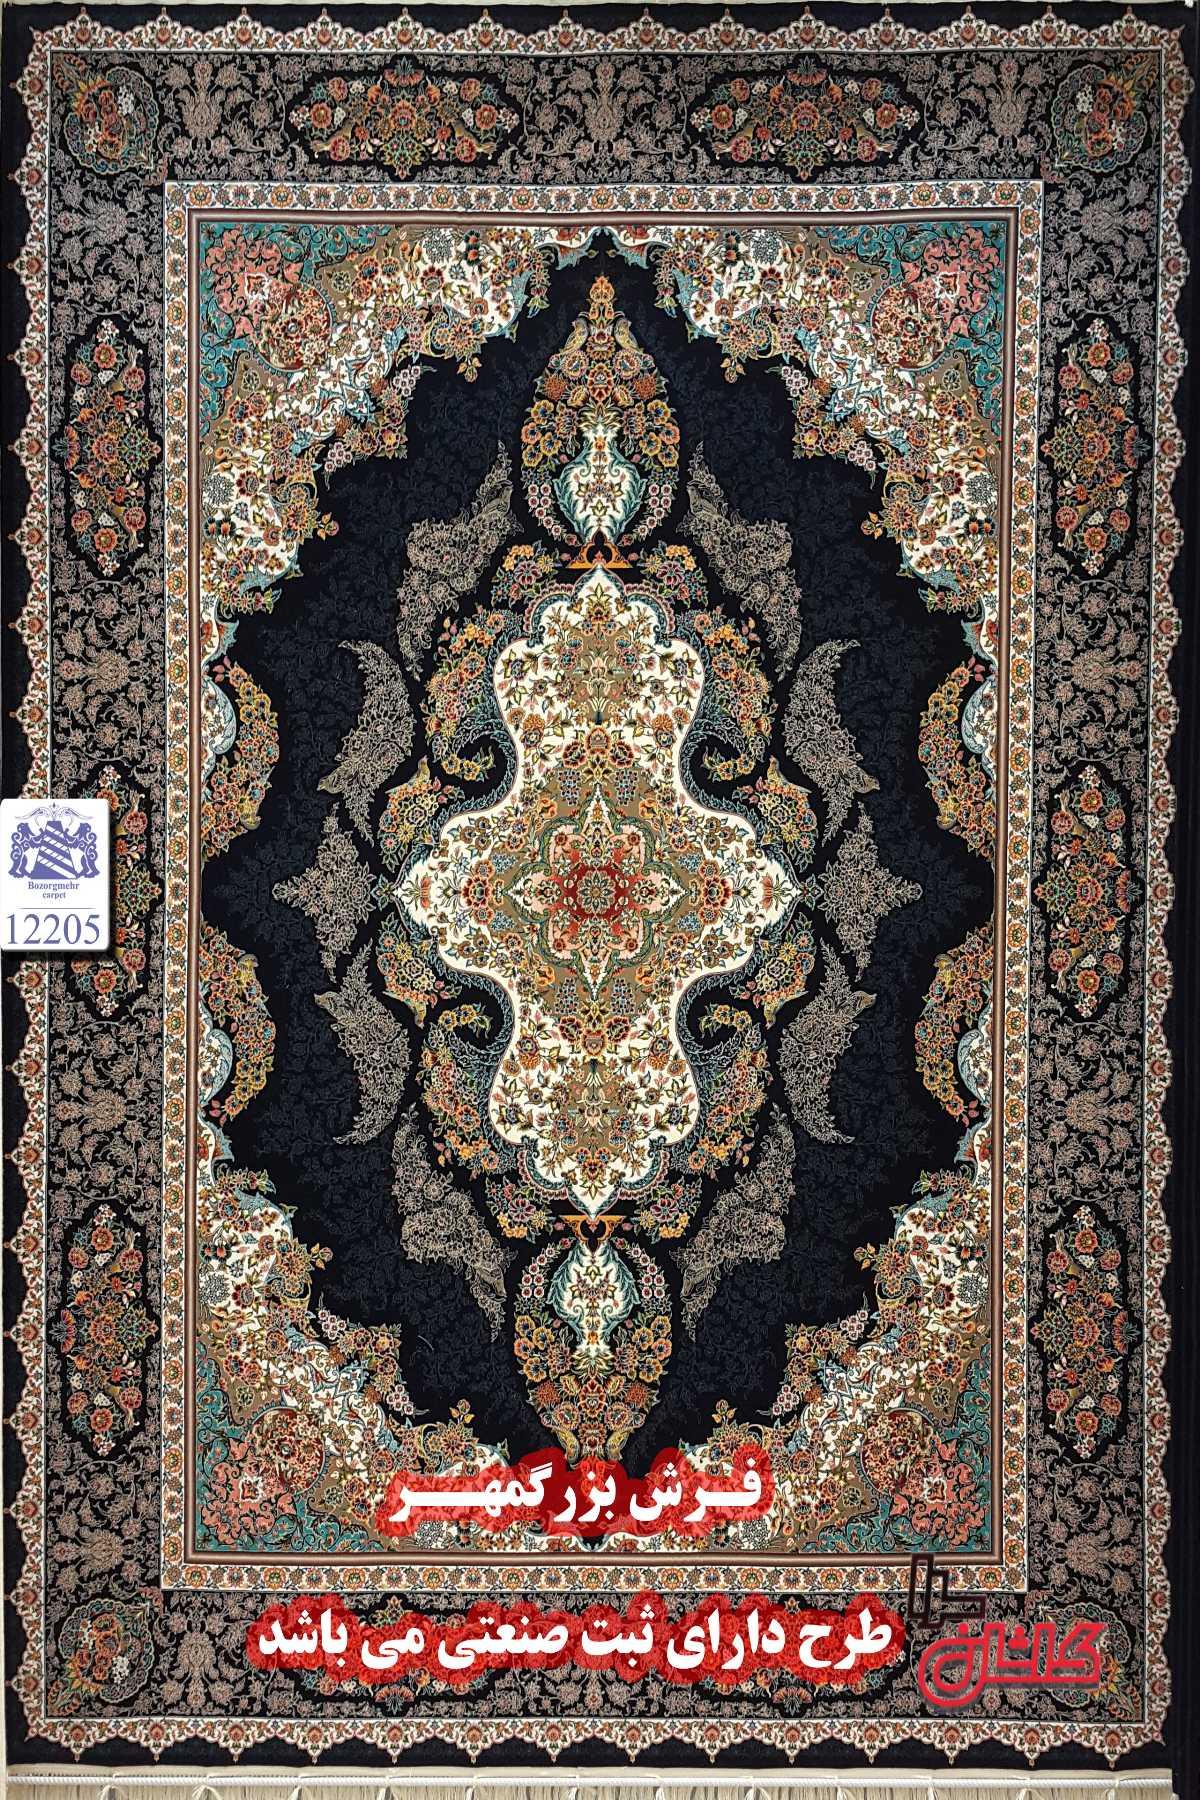 bozorgmehr-1200-reeds-12205-s